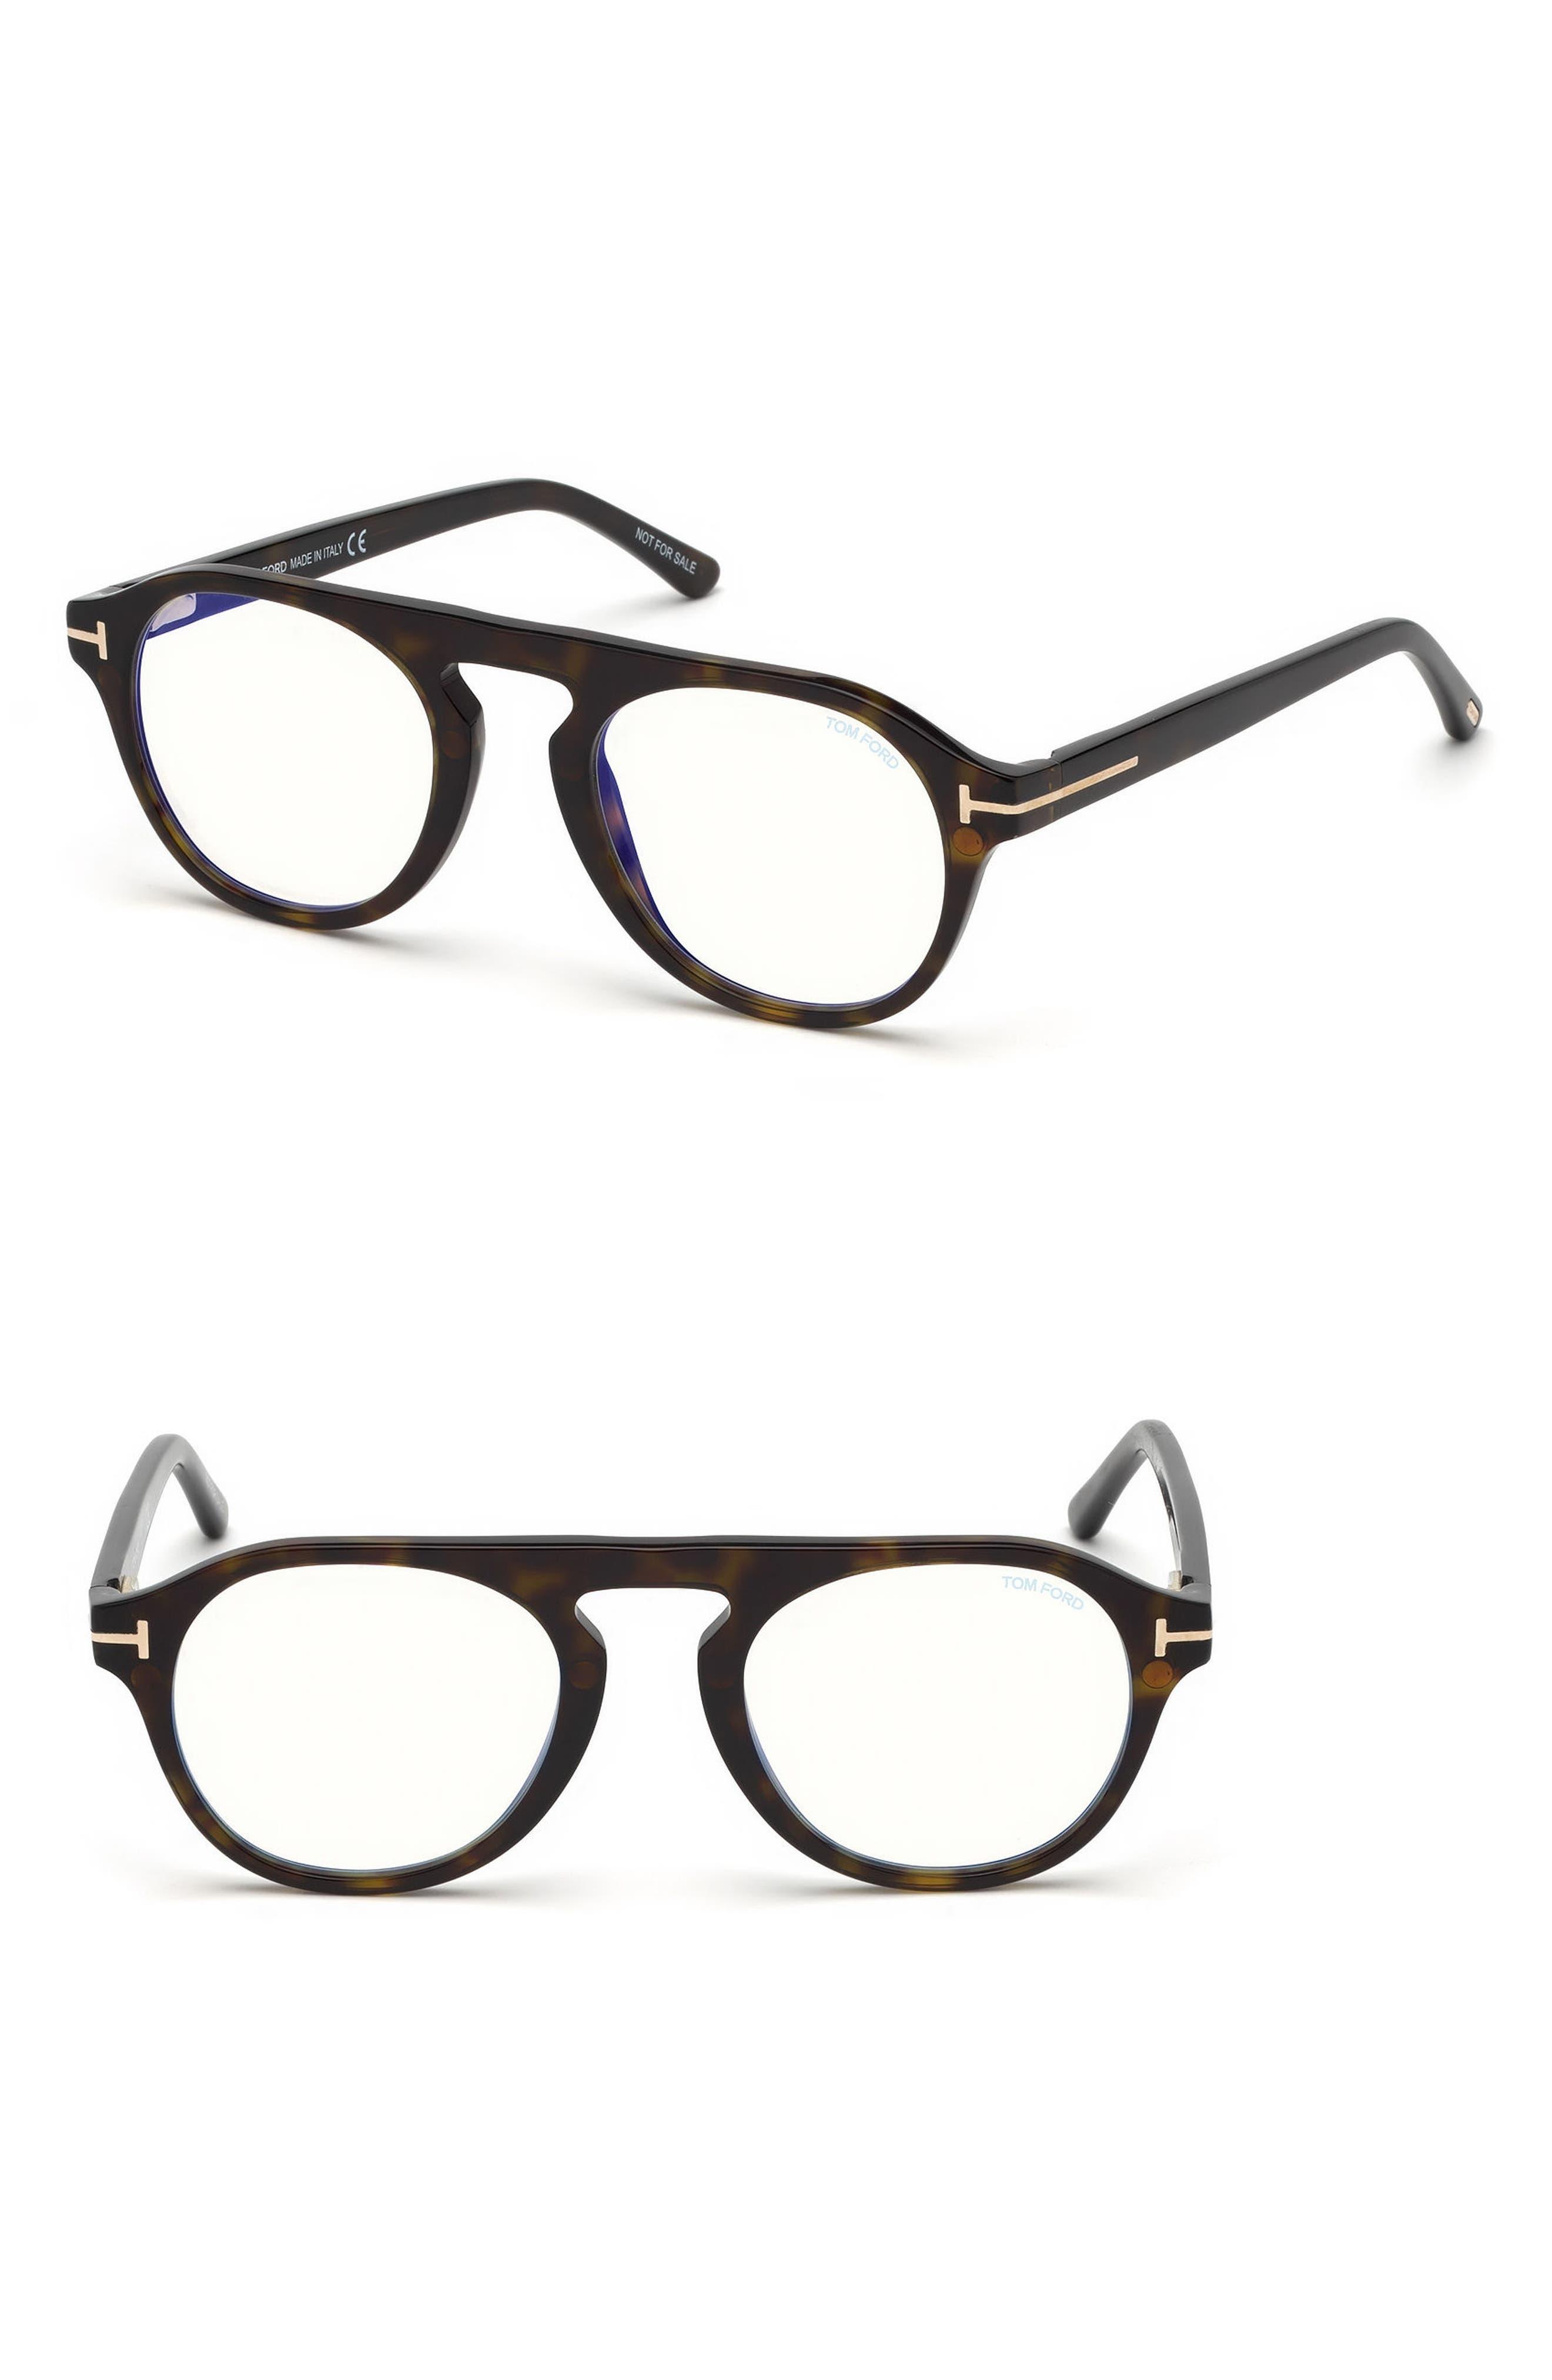 Blueblock 49mm Sunglasses with Clip-On Lens,                         Main,                         color, Dark Havana